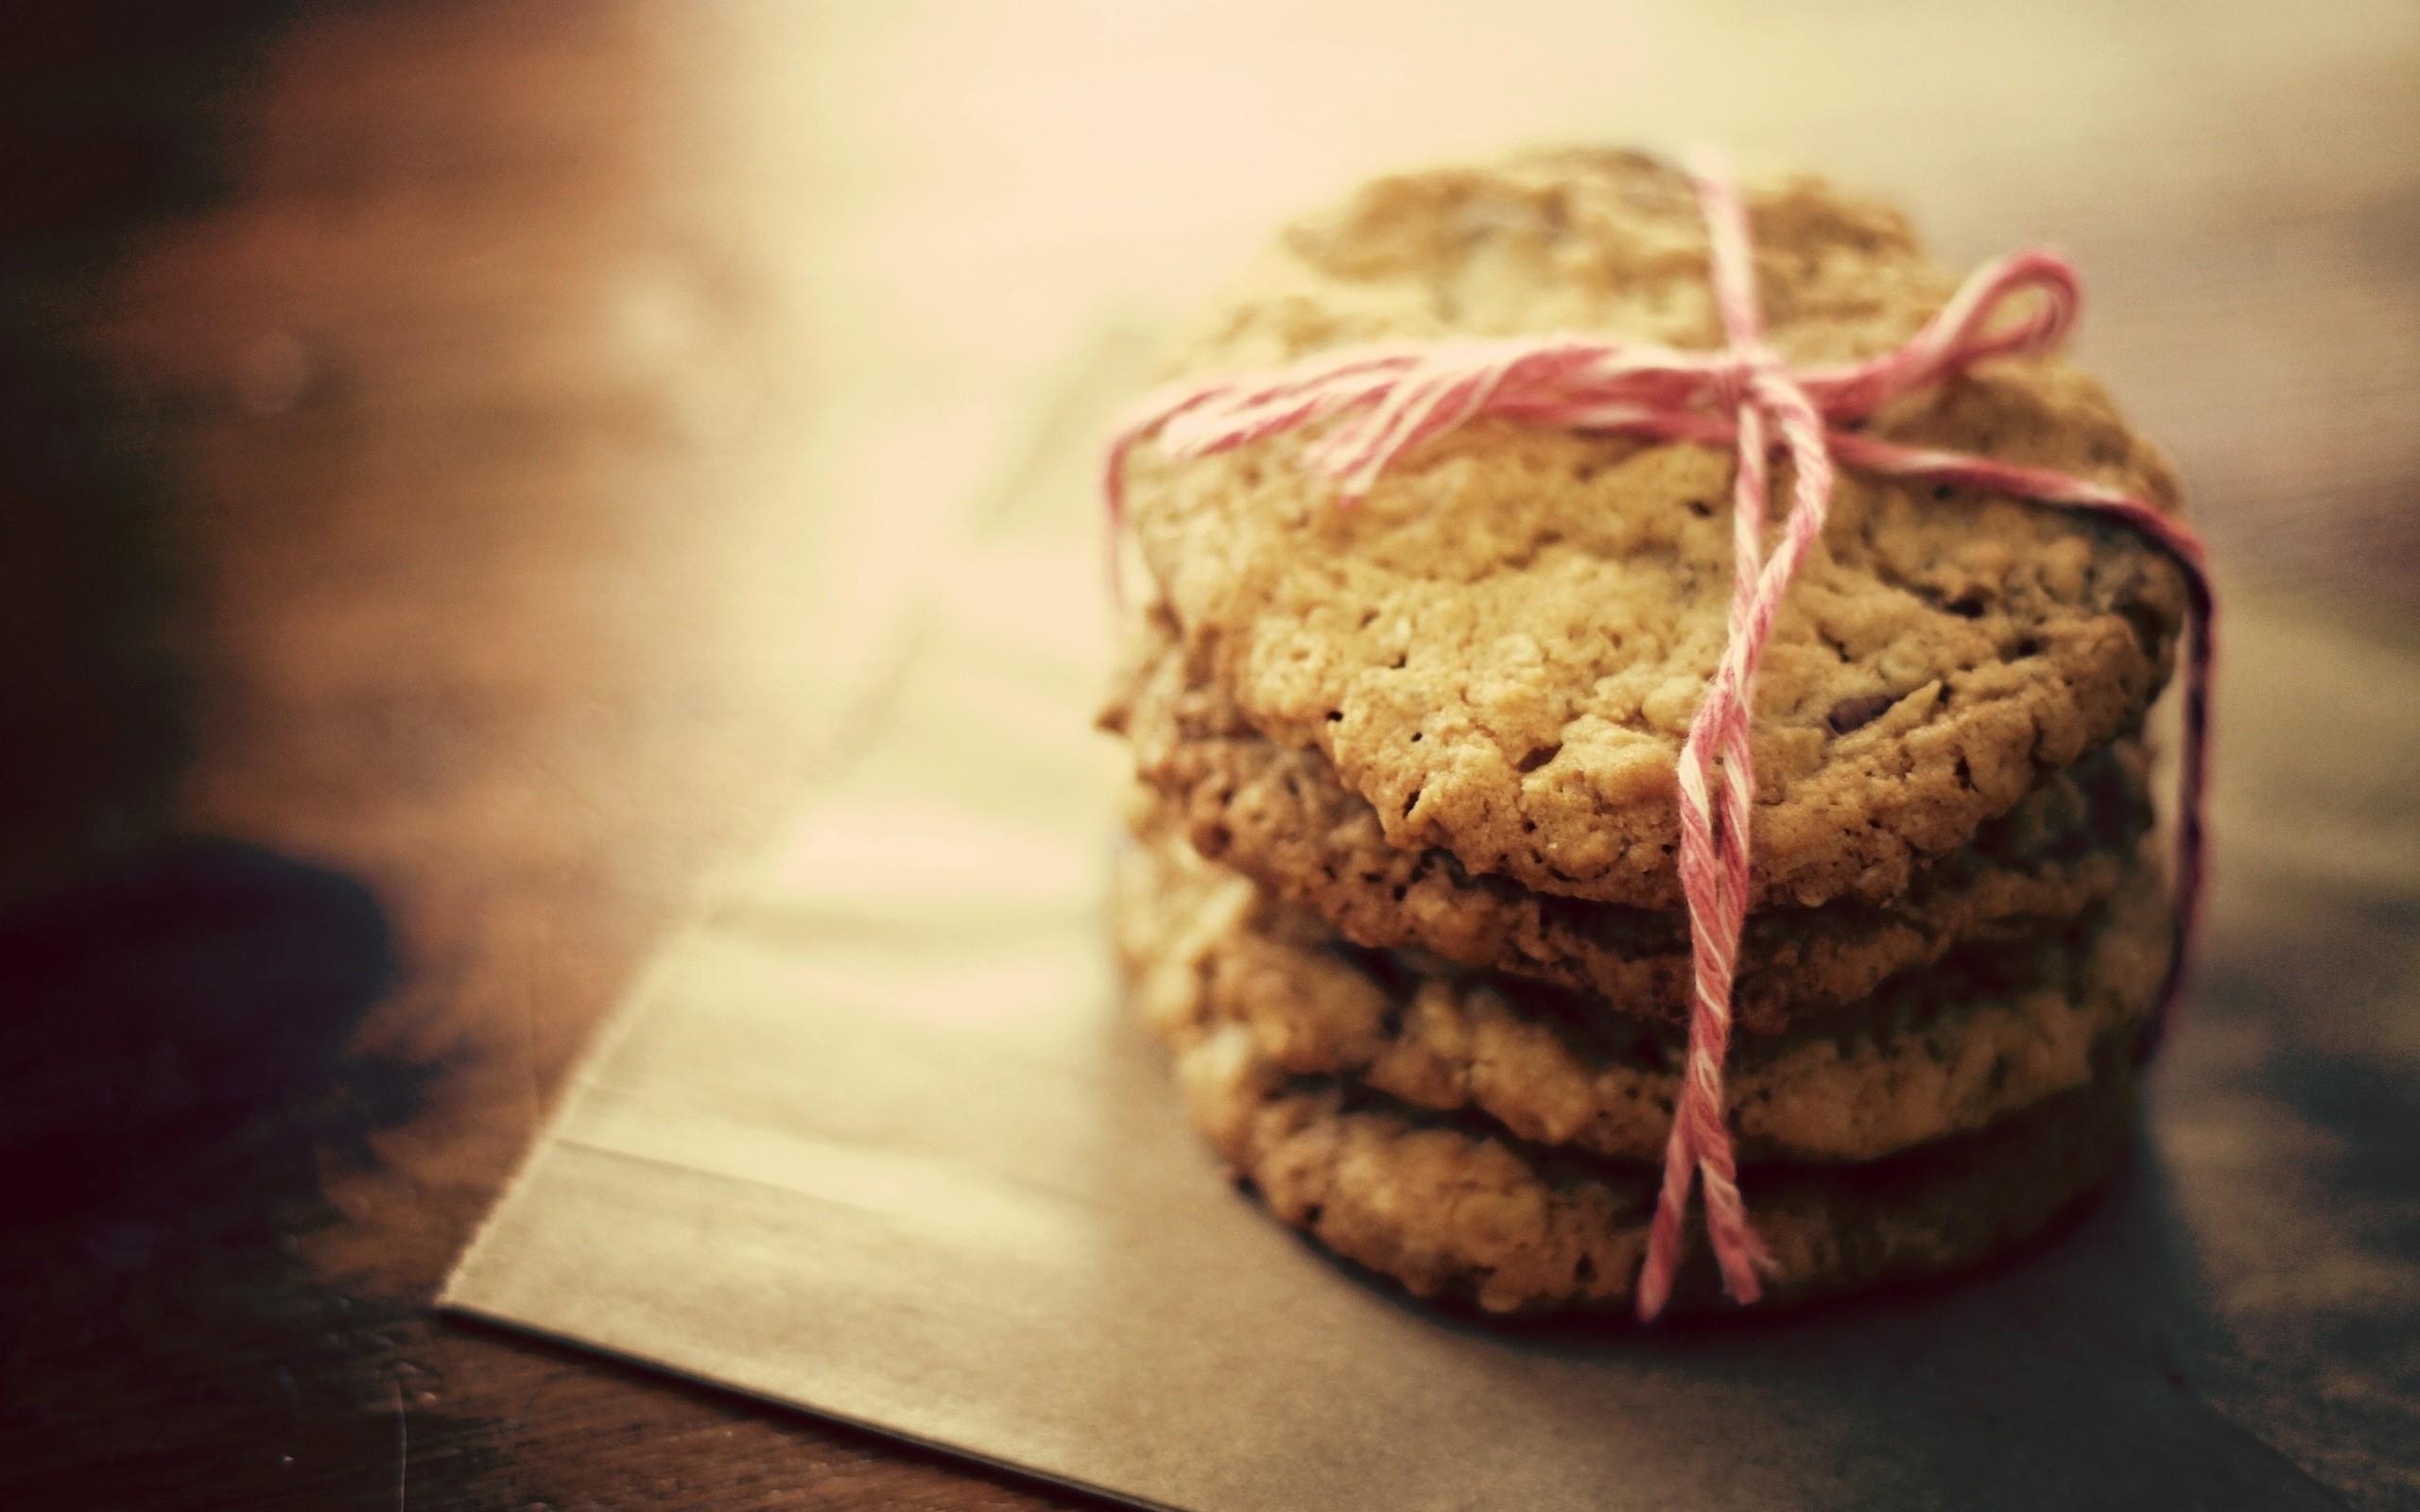 Wallpaper clipart cookie Clipart Cookies Sugar  Cookies